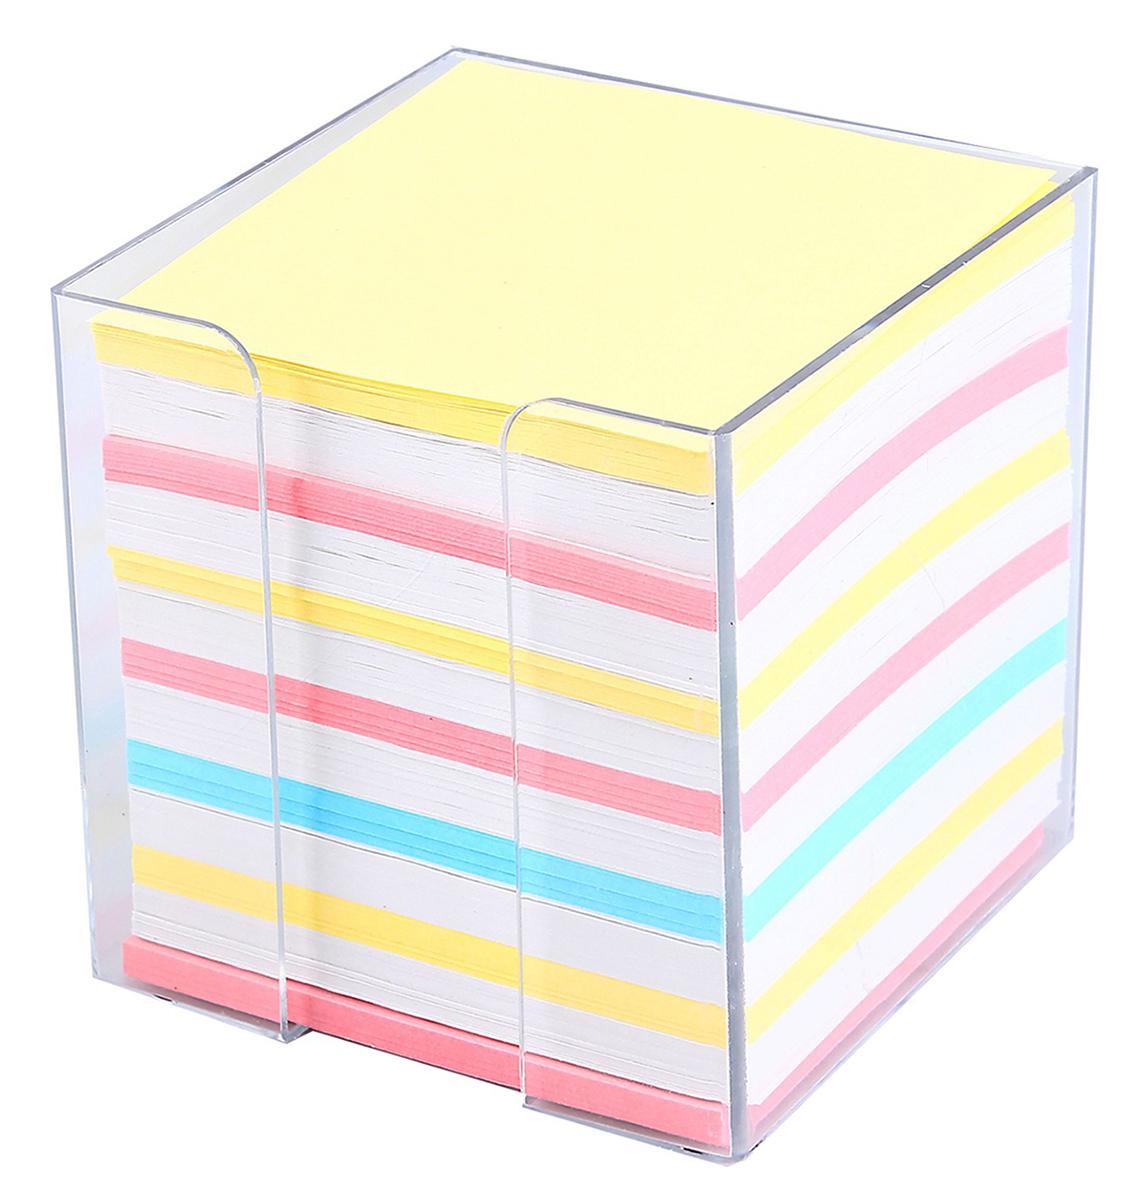 Стамм Блок для записей 9 x 9 см блок для записей тюмень 9 x 9 см 150 листов